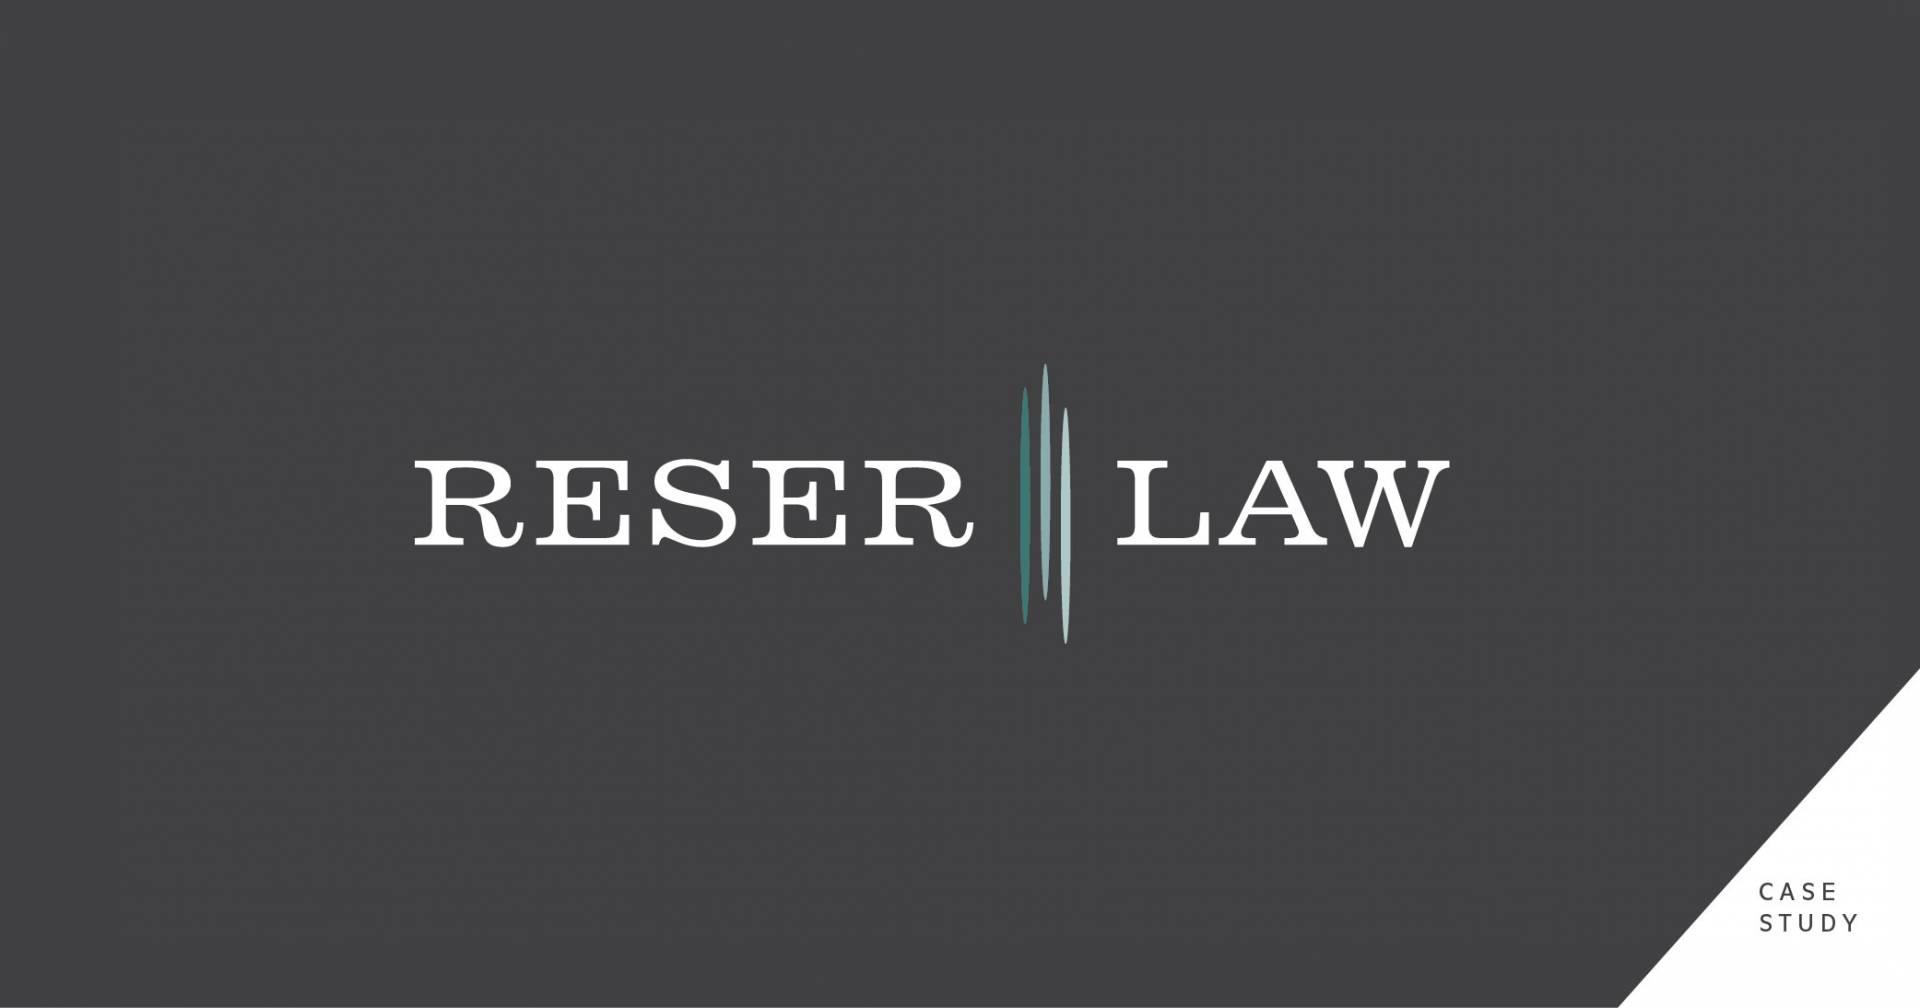 Reser Law